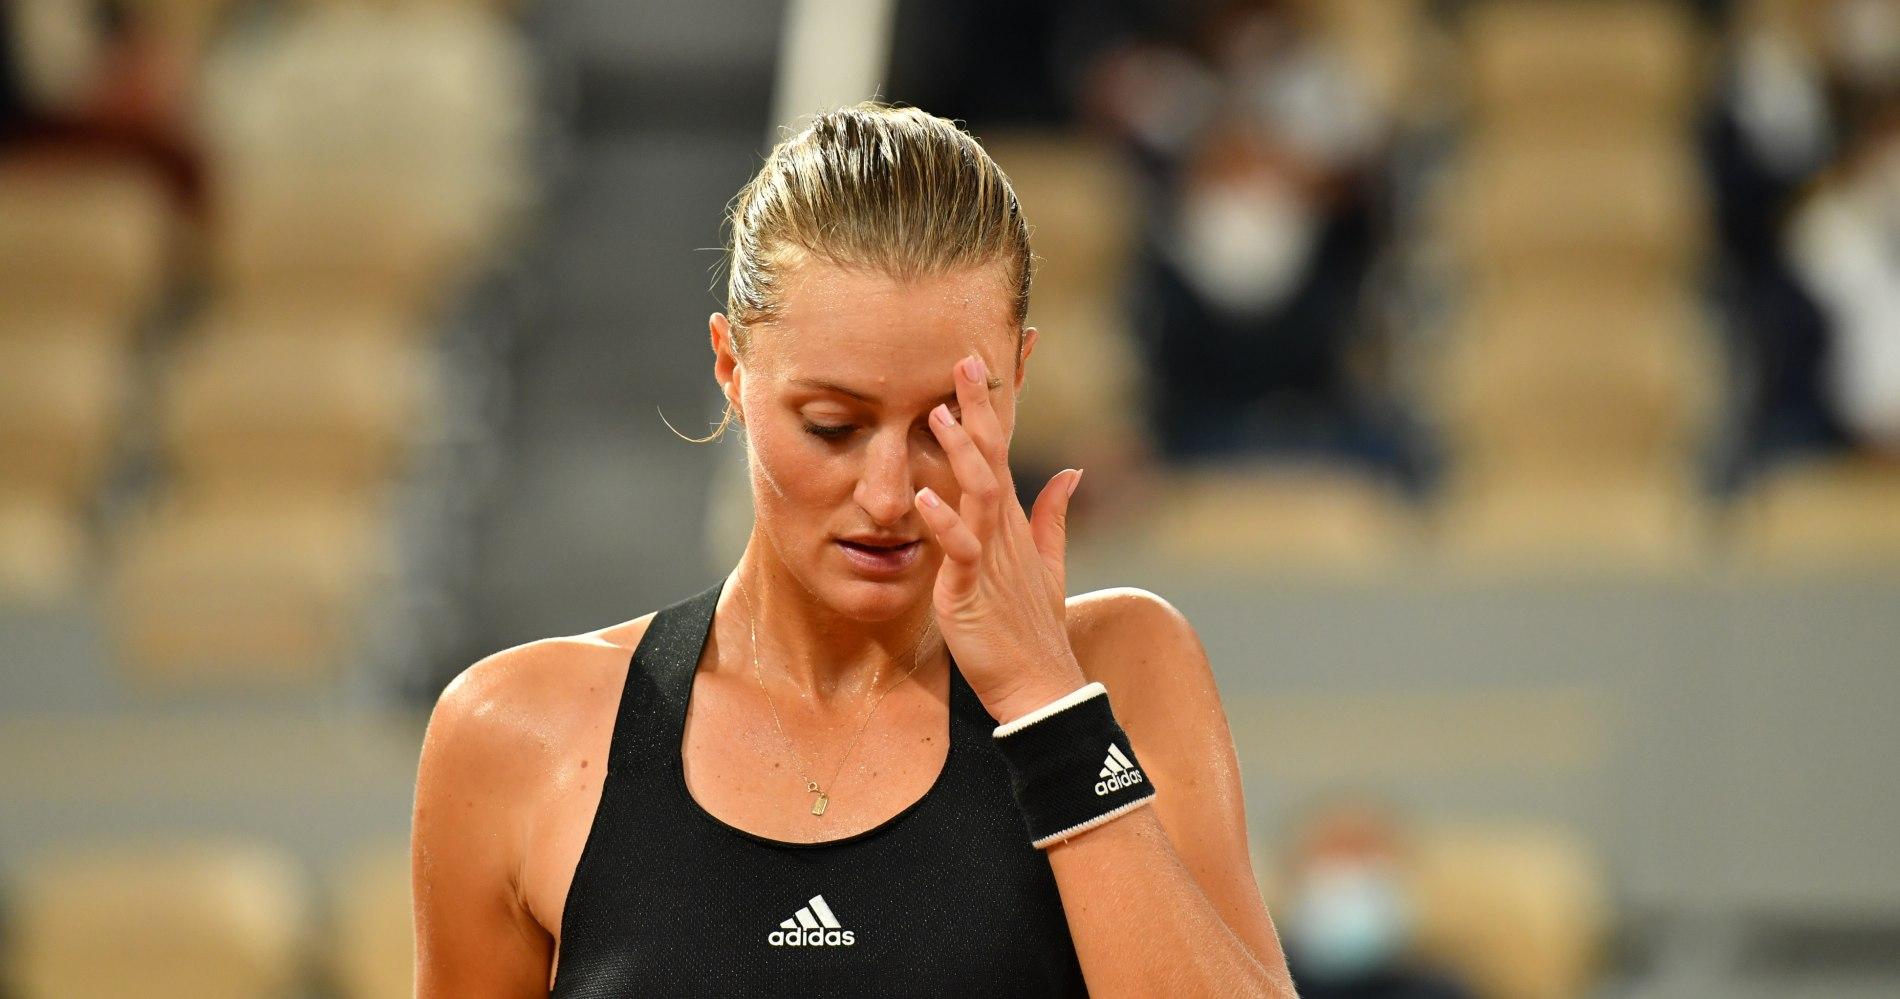 Kristina Mladenovic - 1st round Roland-Garros 2020